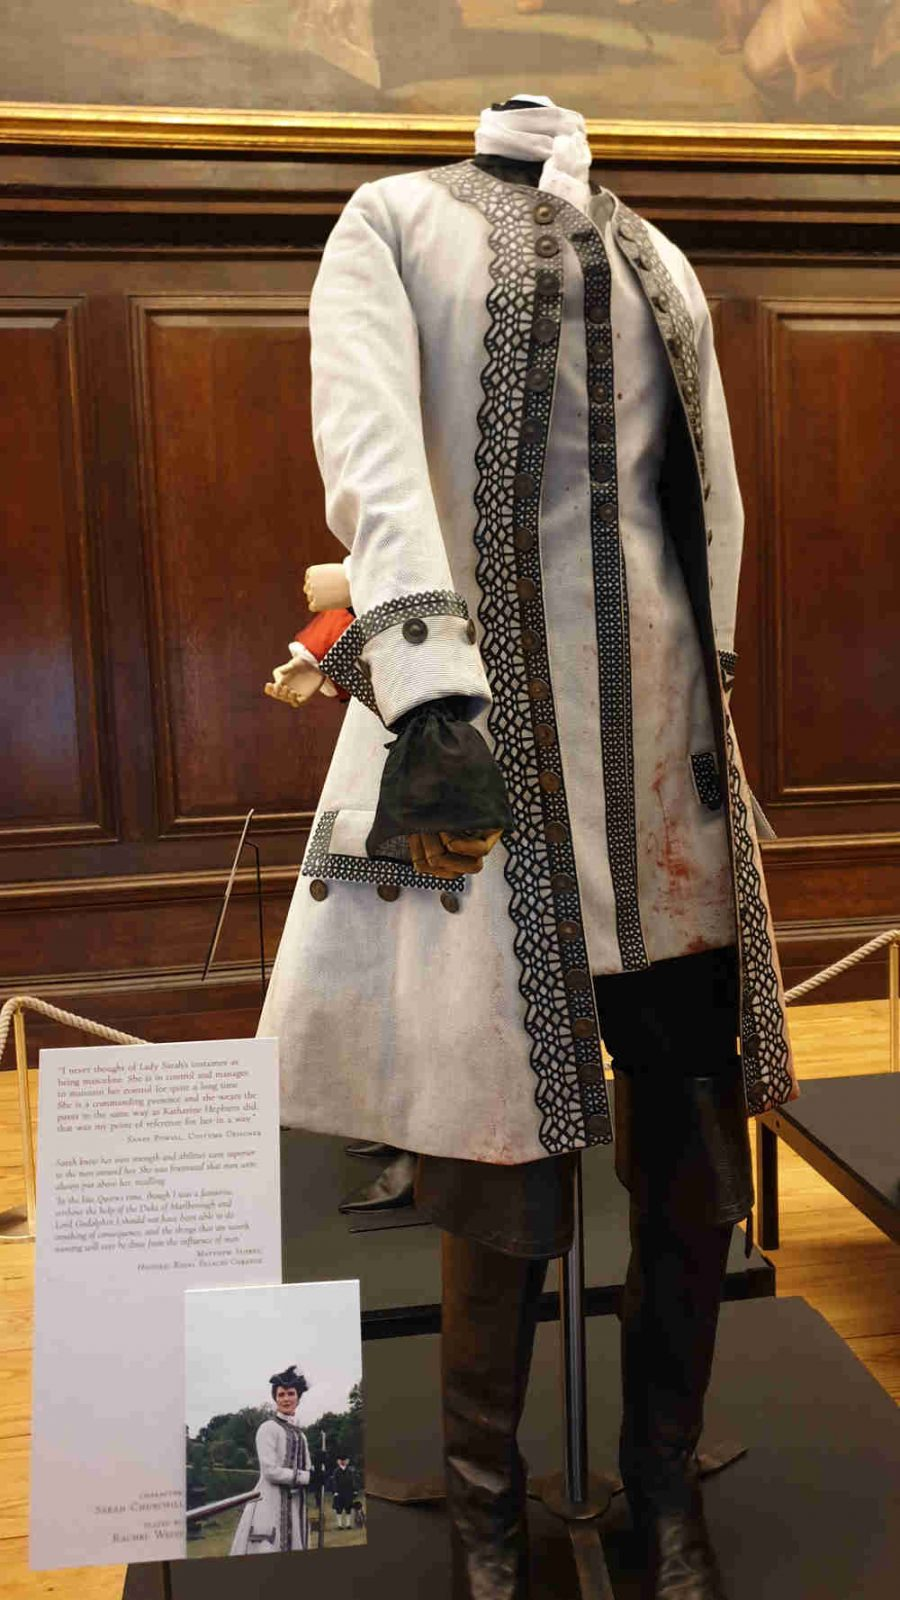 The Favourite, Costumes, Hampton Court Palace, Queen Anne, Rachel Weisz, riding outfit